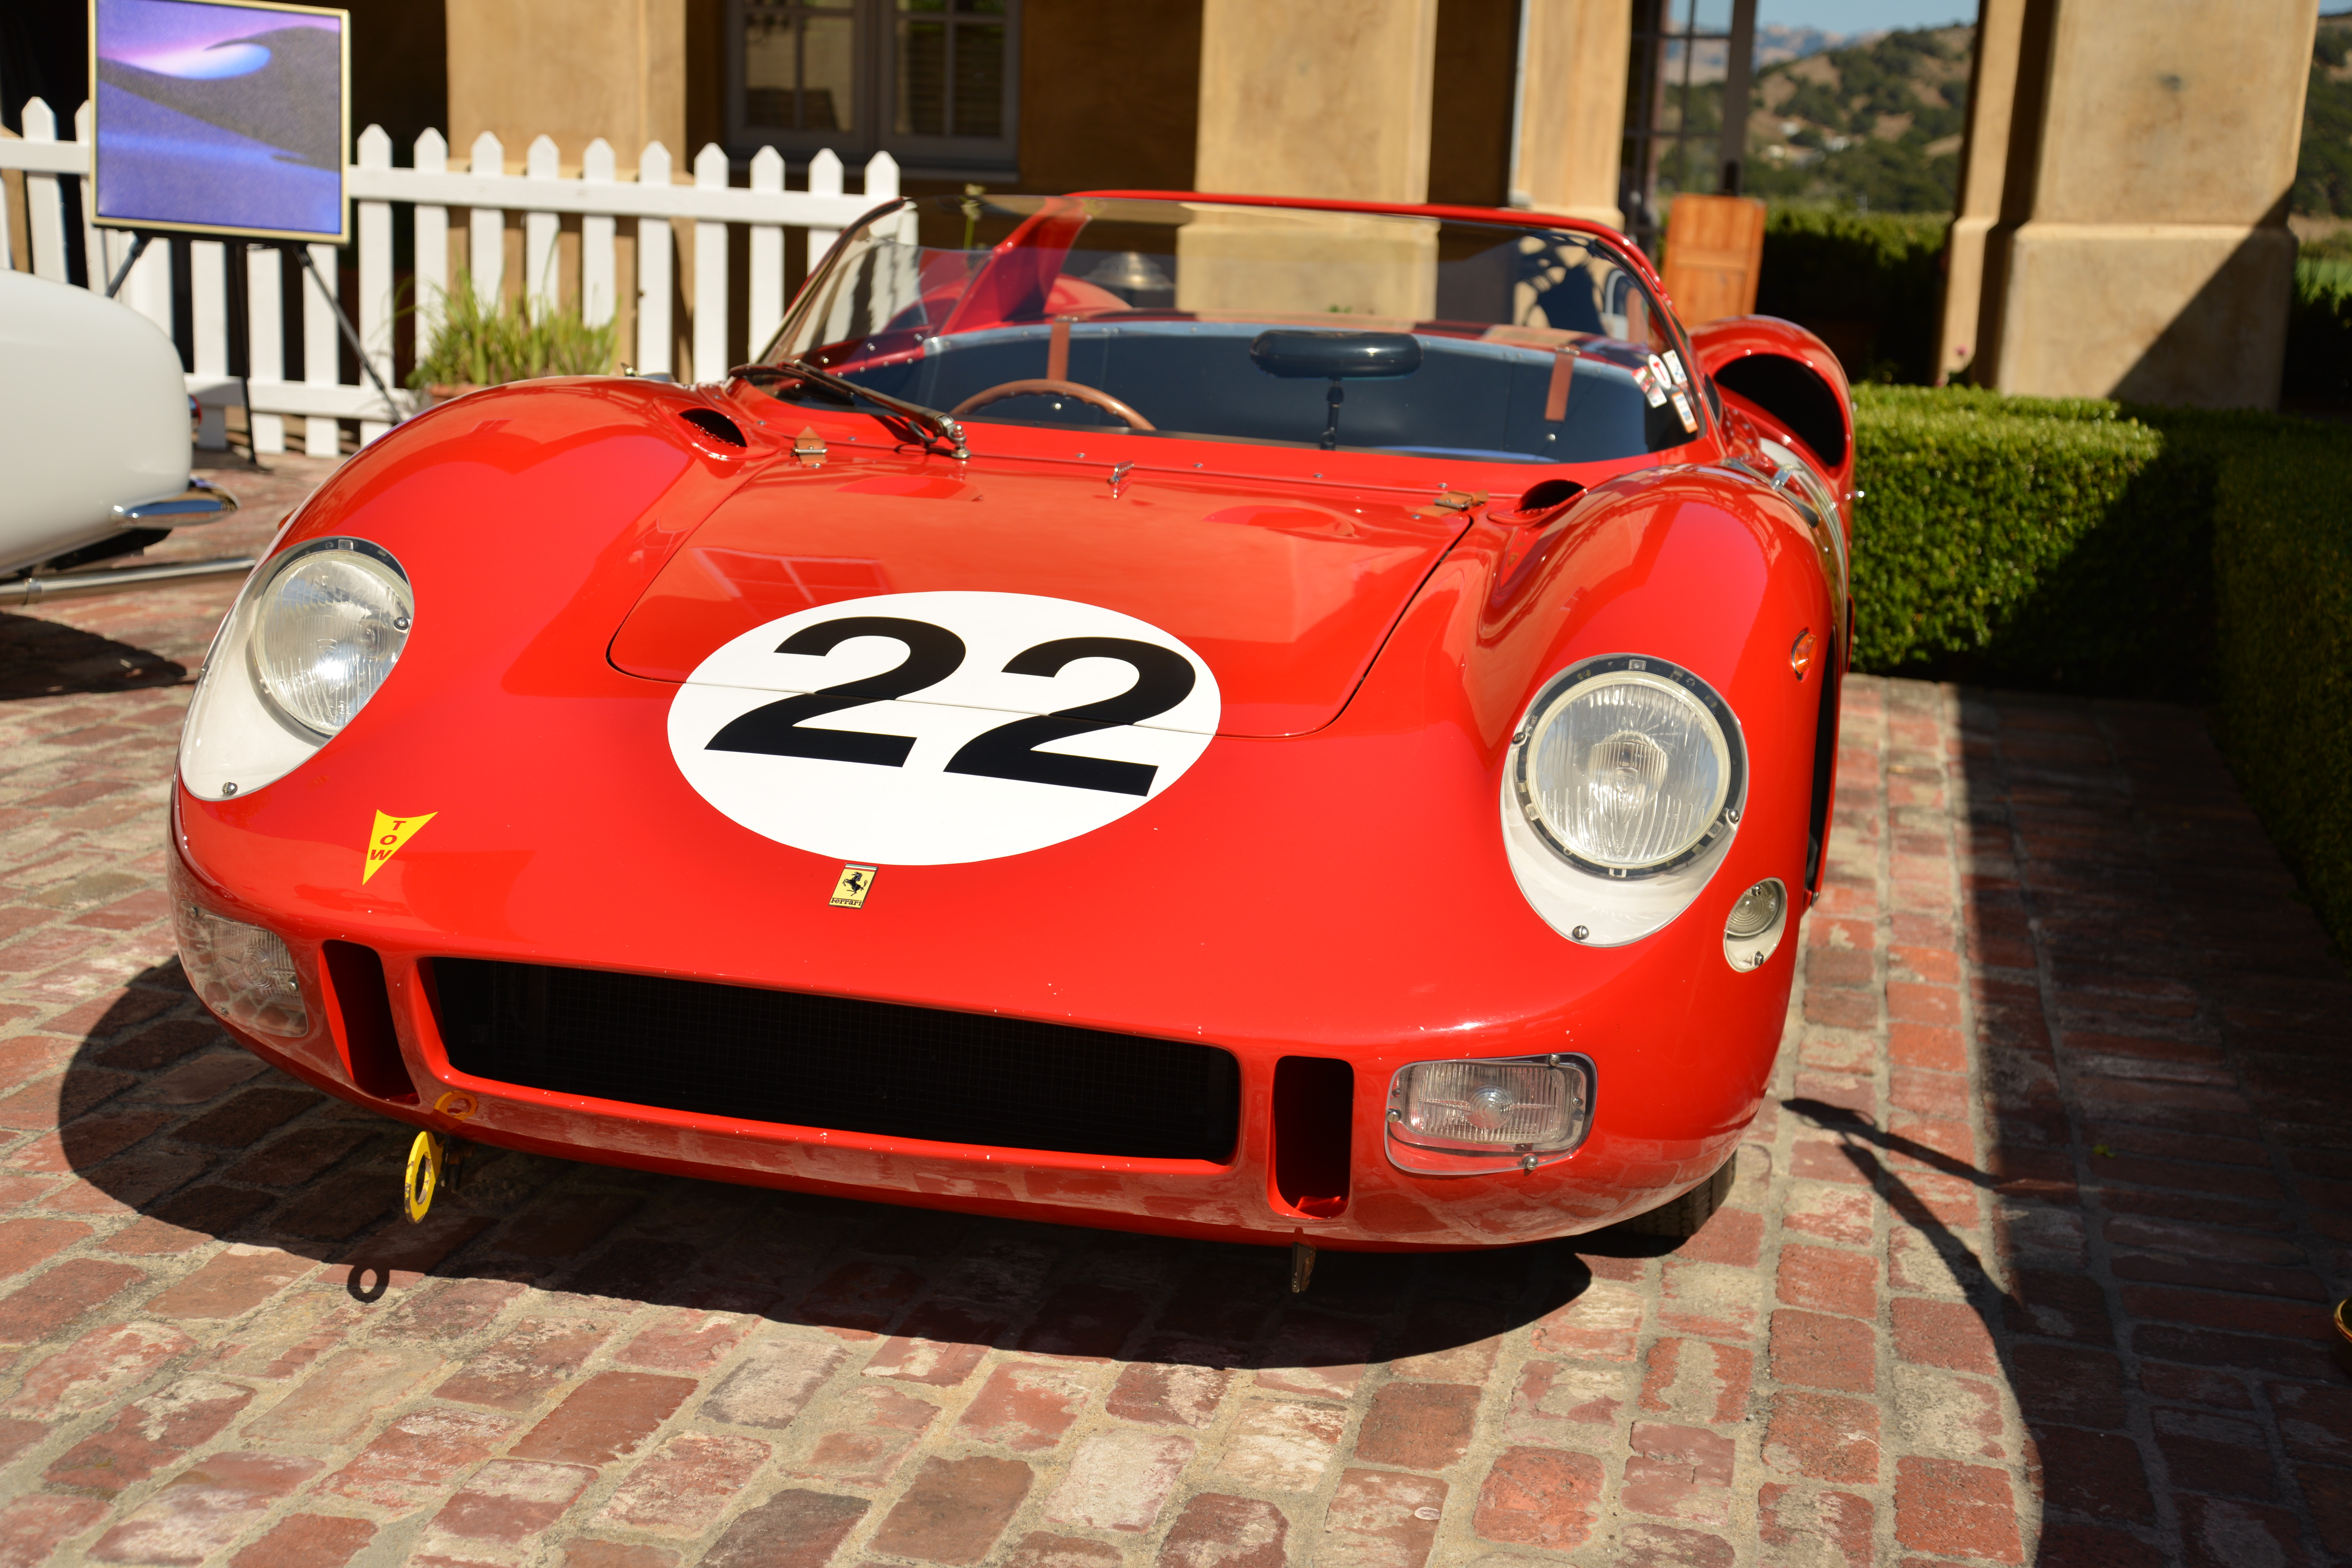 Pasadera Concours, New Pasadera Concours jump starts Monterey Car Week, ClassicCars.com Journal